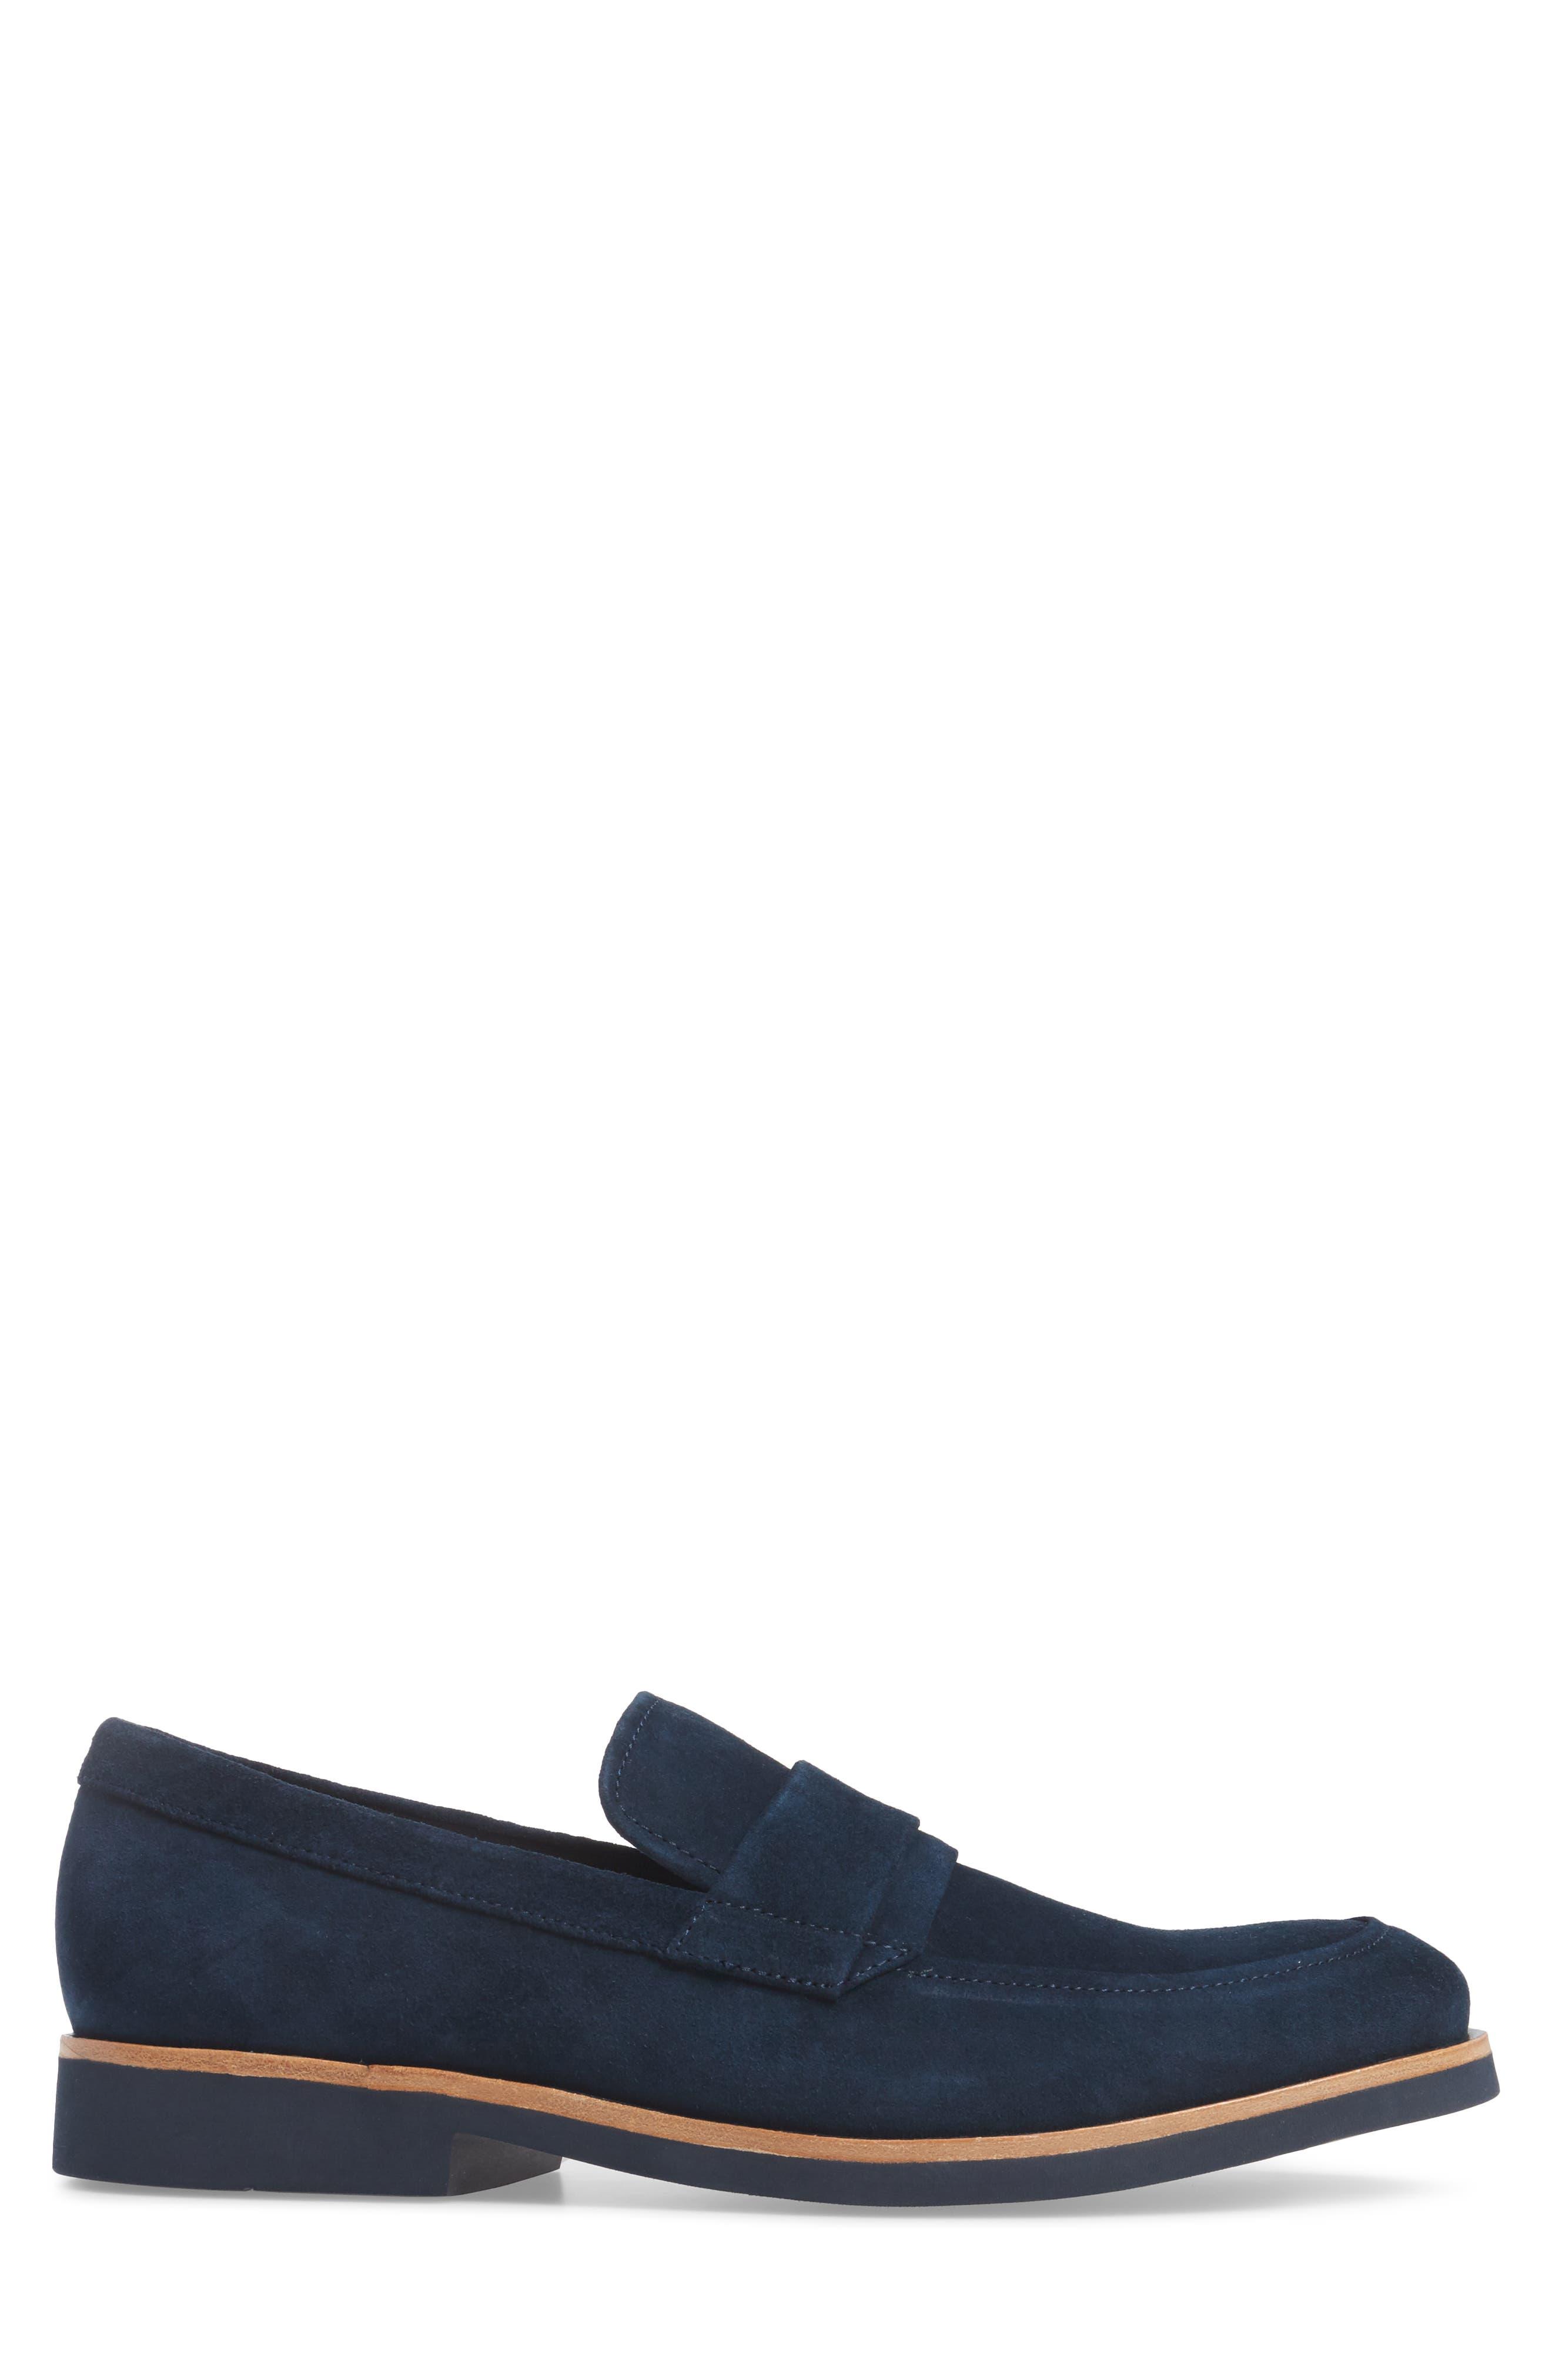 Men S Green Slip On Loafers Driving Shoes Moccasins Nordstrom